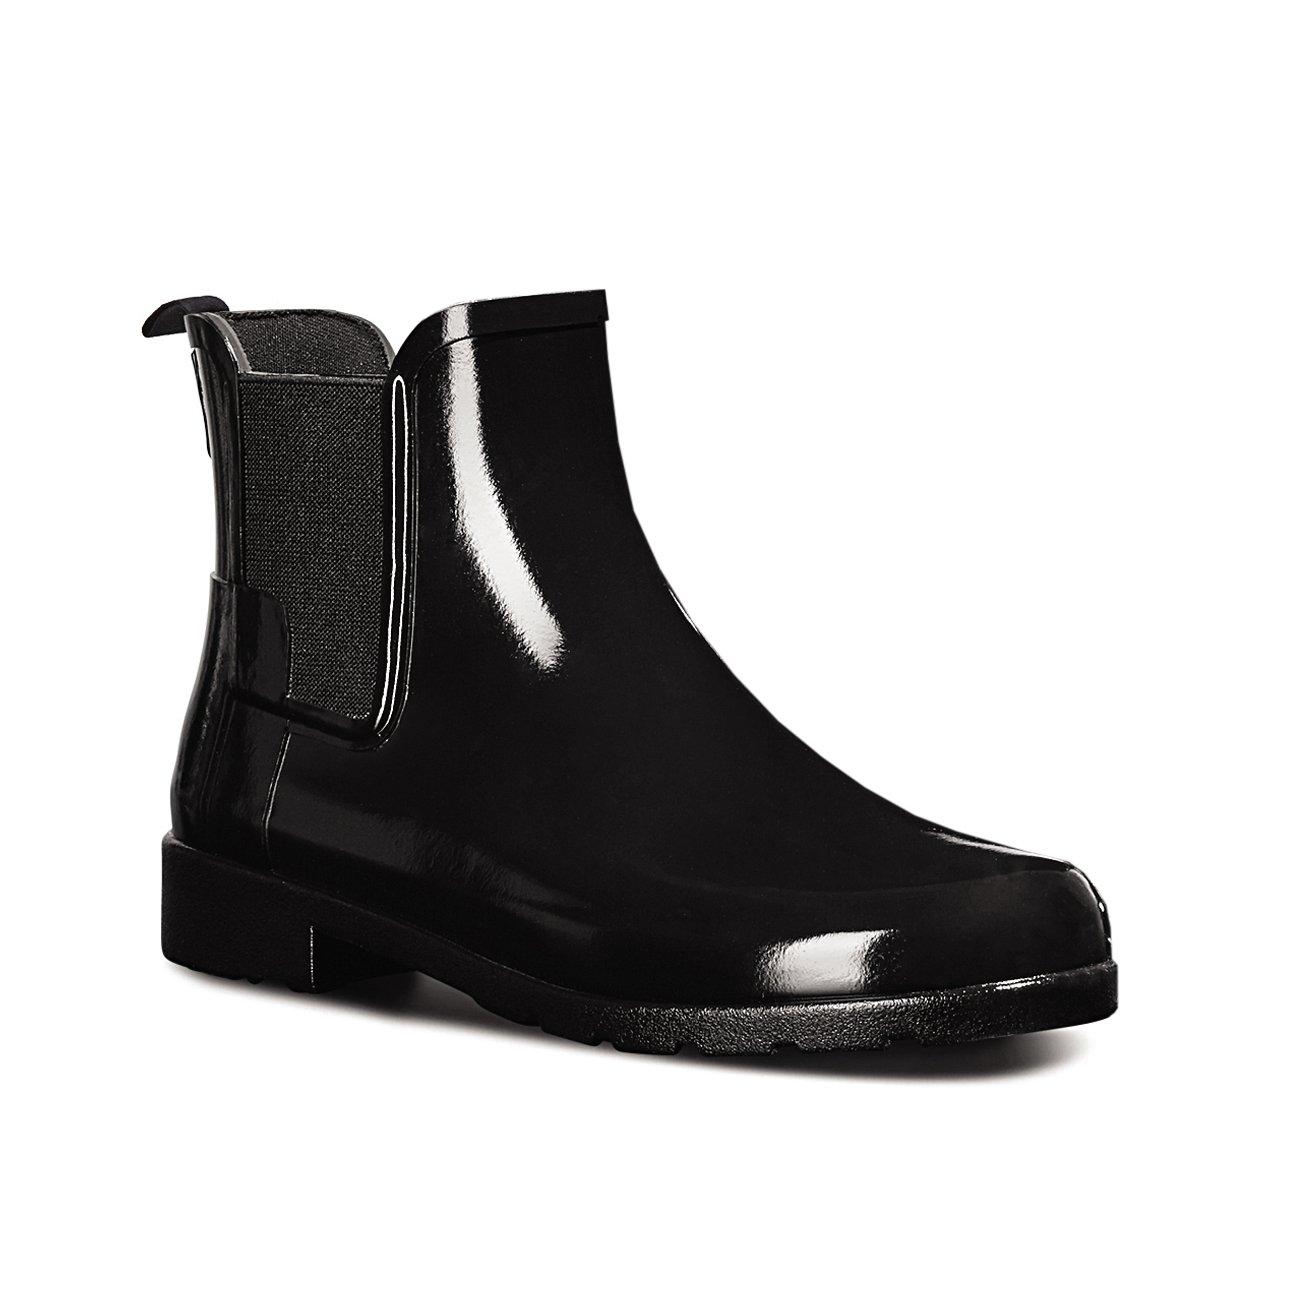 Hunter Womens Original Refined Chelsea Gloss Wellingtons Ankle Rain Boot - Black - 10